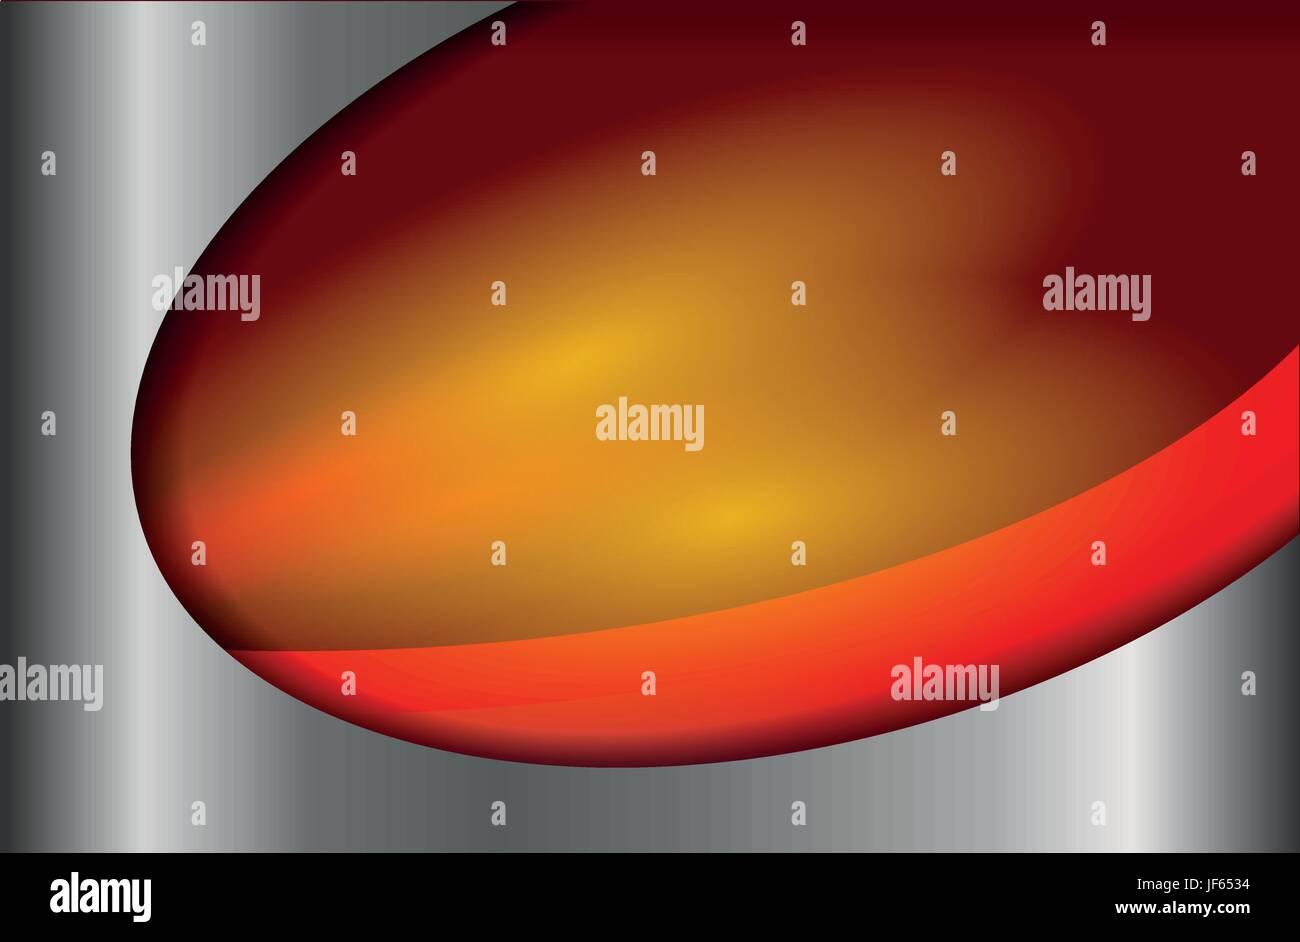 arc, blurred, gradient, metallic, curve, shaddow, shadow, orange, arc, steel, - Stock Vector